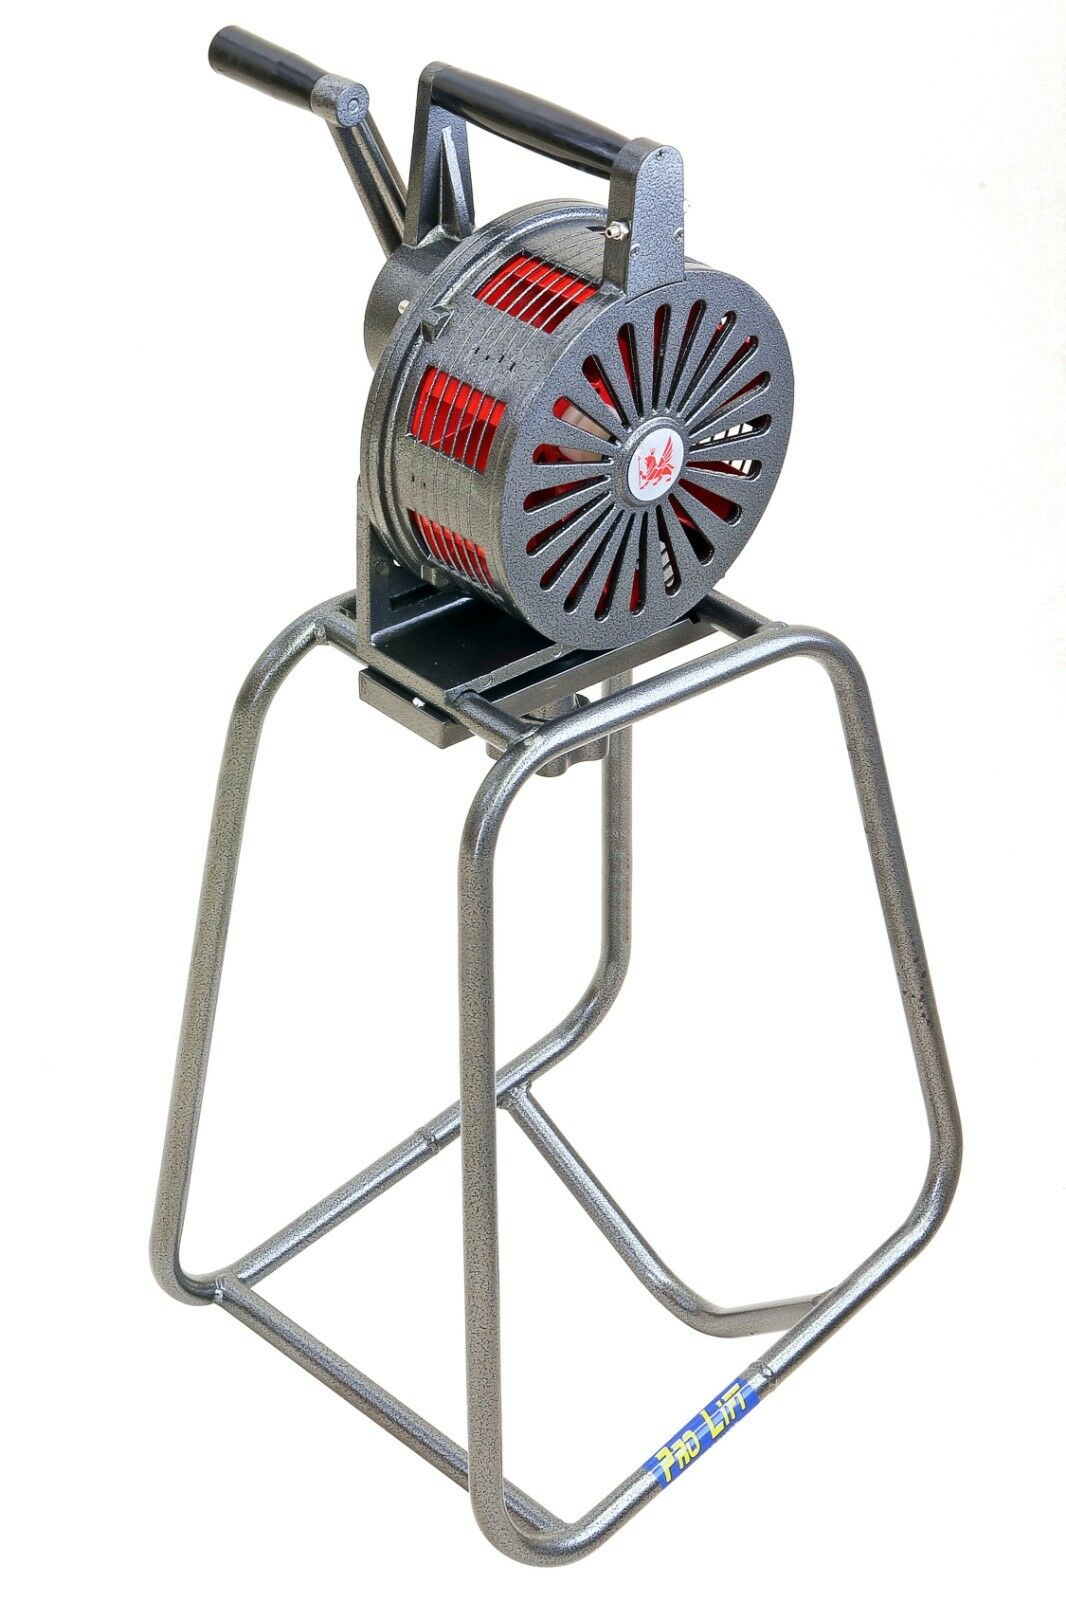 120dB Standsirene Handsirene Alarm Lufthorn stabiler Standfuß lautstark 00260